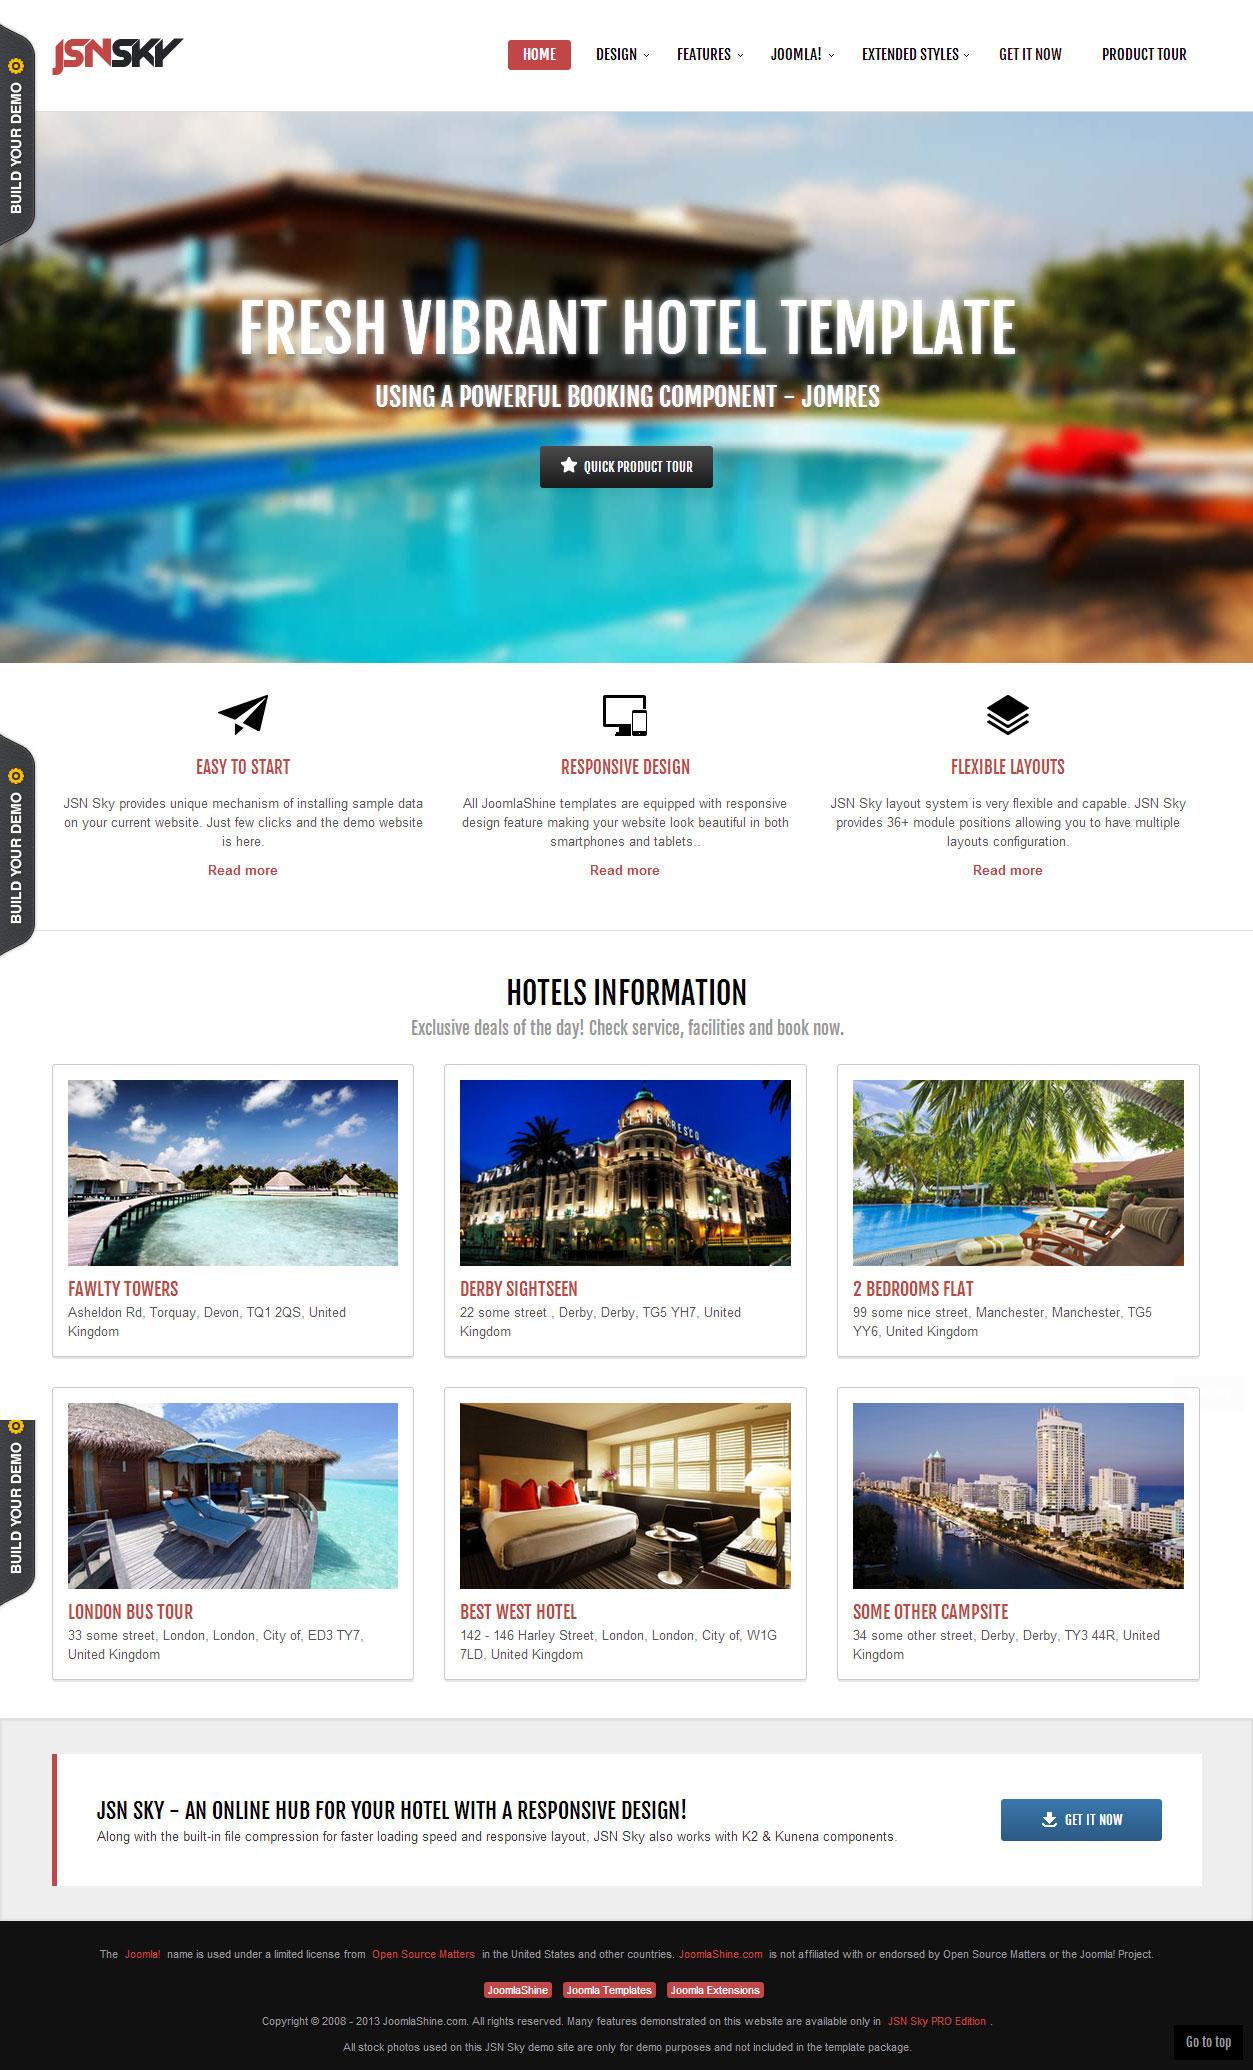 5 best responsive parallax scrolling joomla templates 2013 responsivemiracle. Black Bedroom Furniture Sets. Home Design Ideas